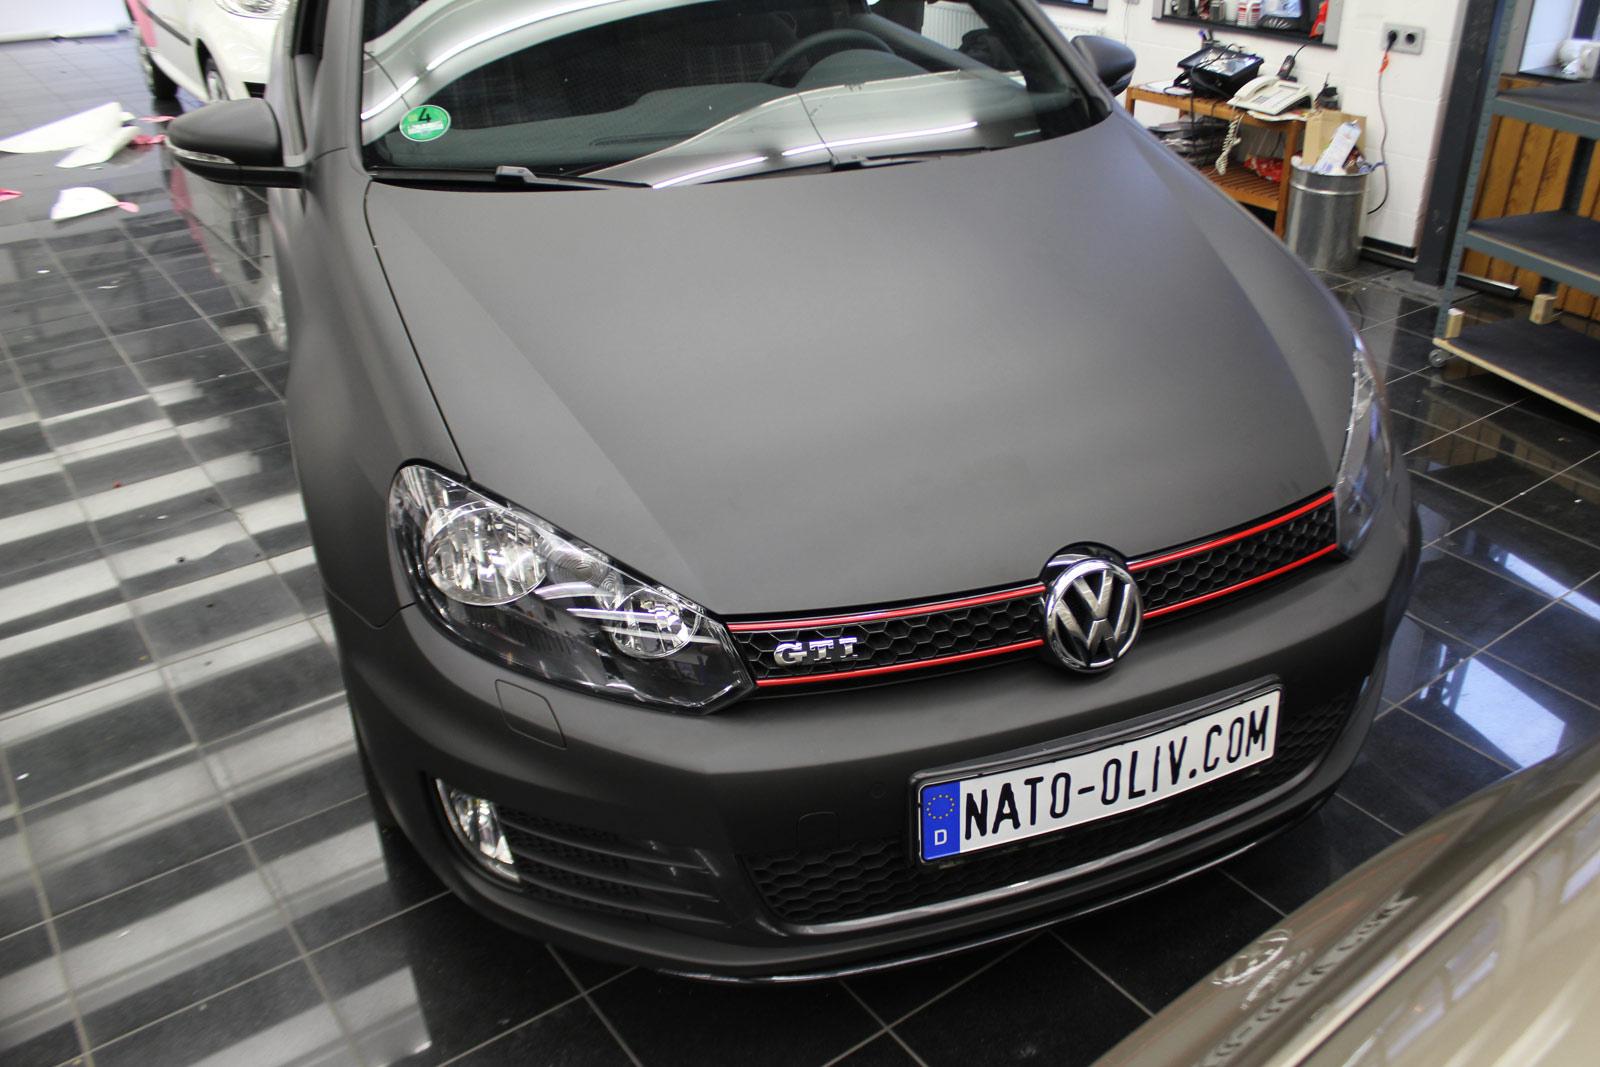 VW_GOLF_GTI_SCHWARZ_MATT_SCHEIBENTOENUNG_01